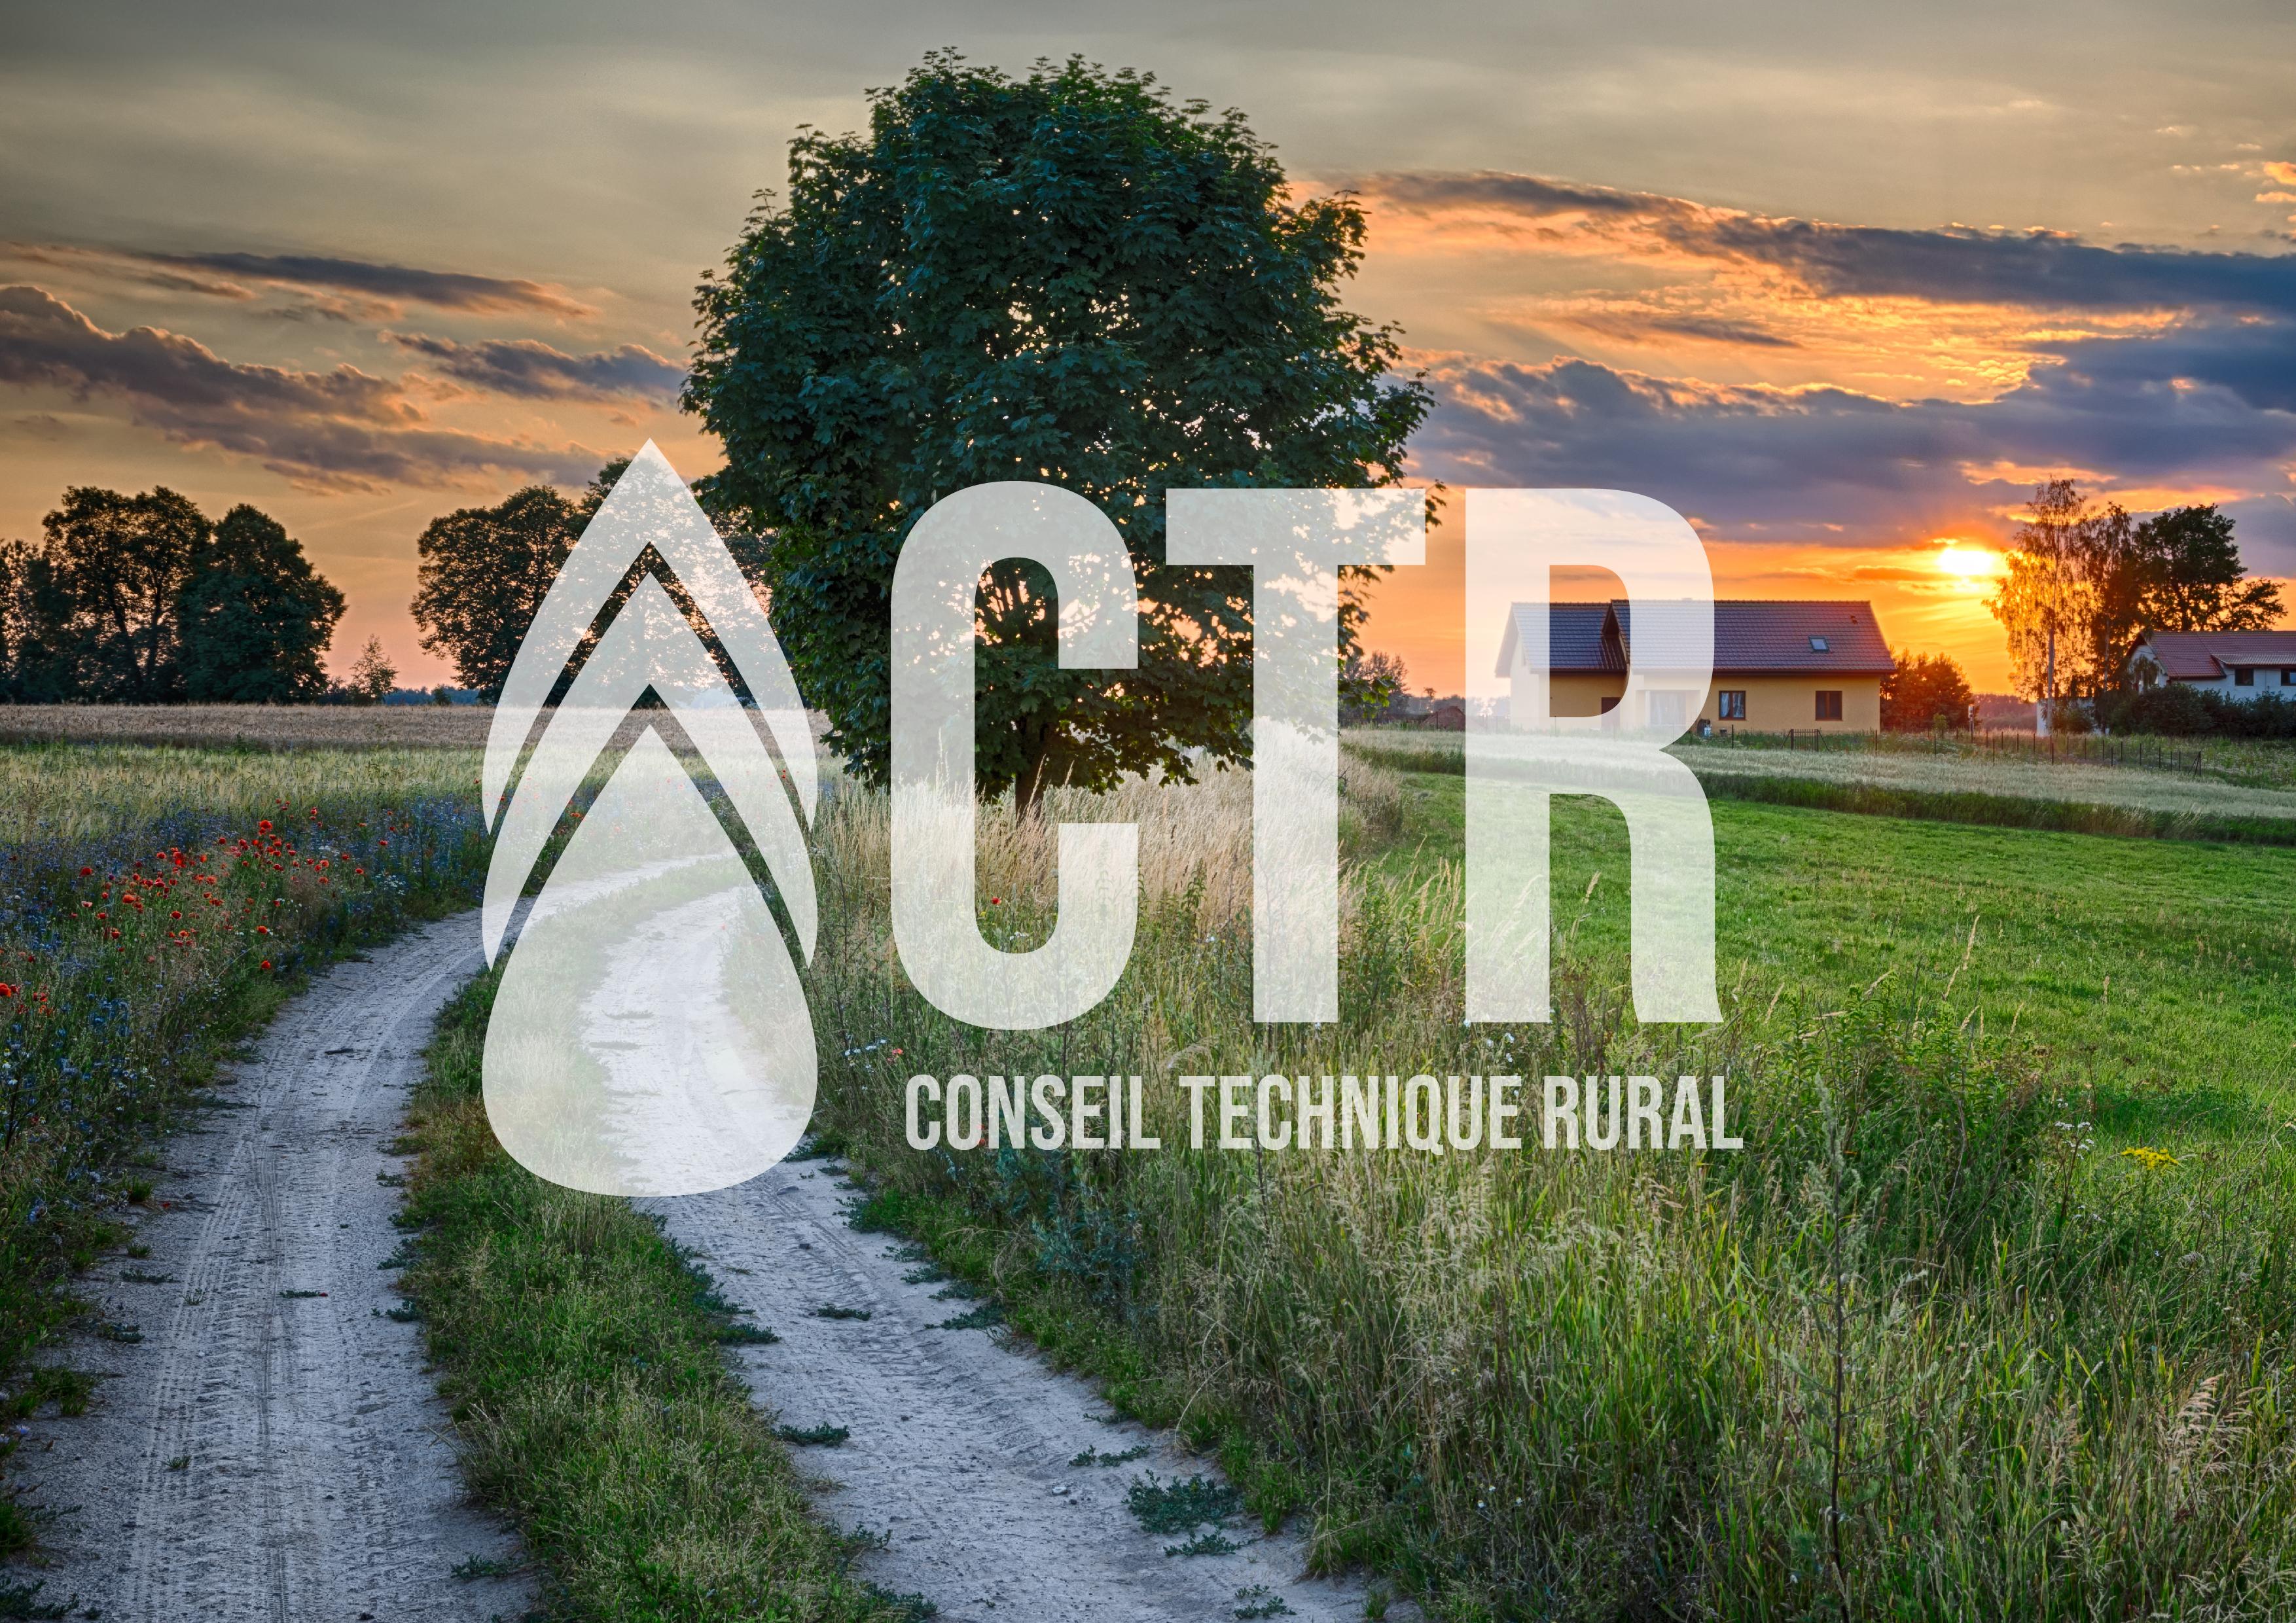 CTR - Conseil technique rural